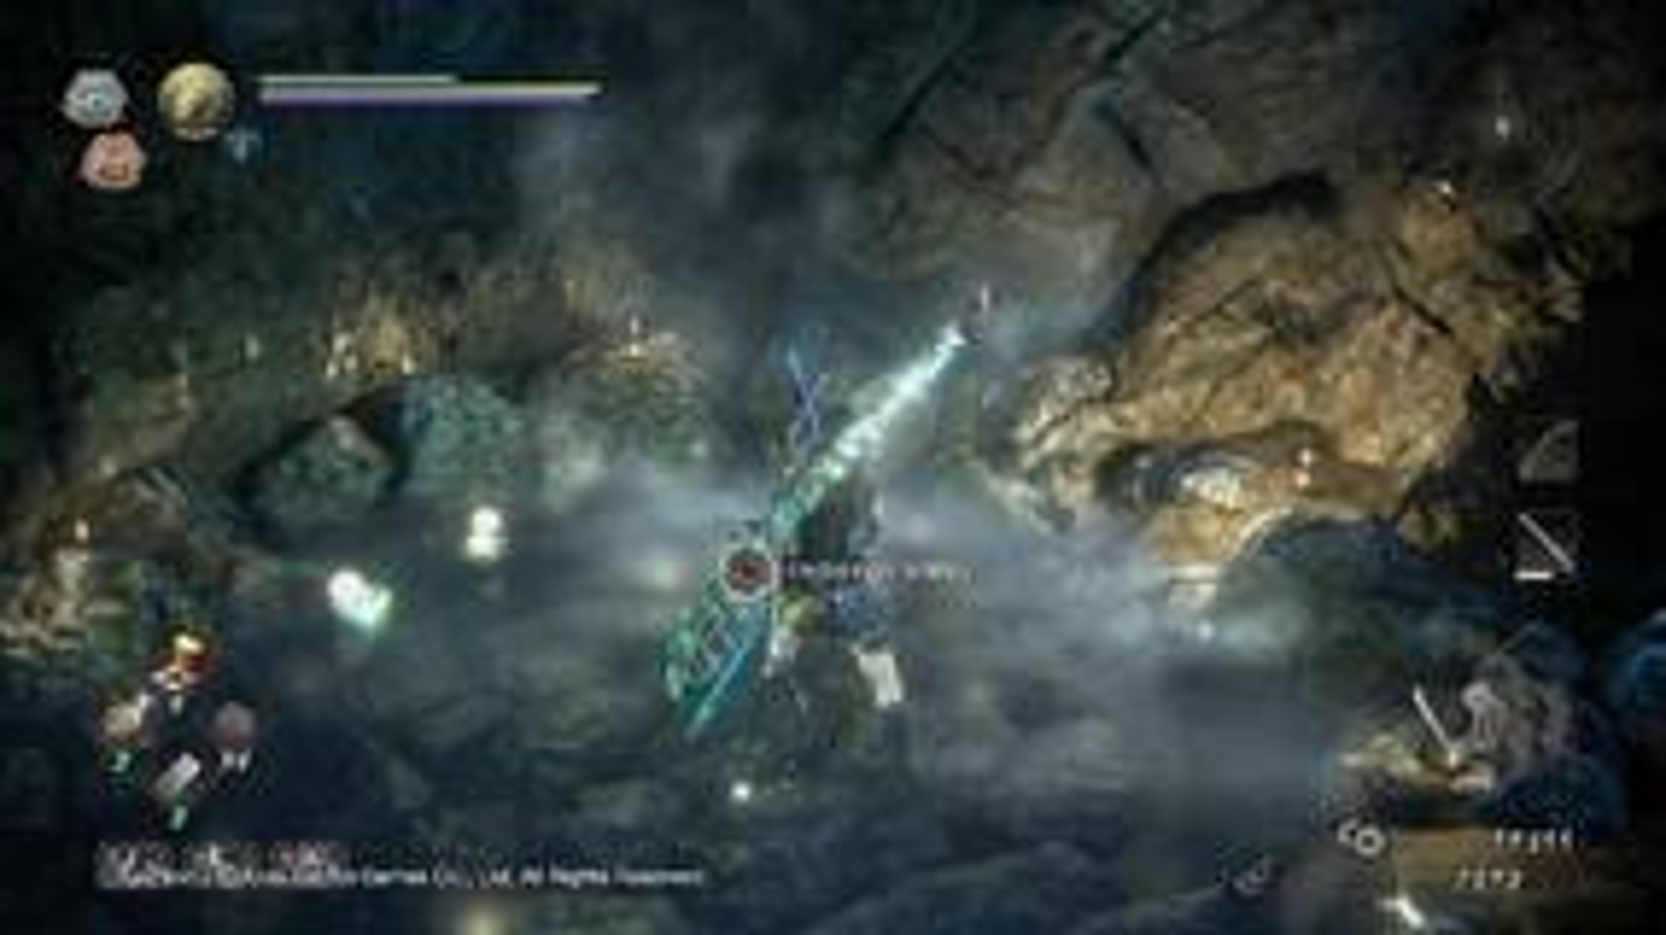 Image for Nioh 2 - How to beat the Kamaitachi